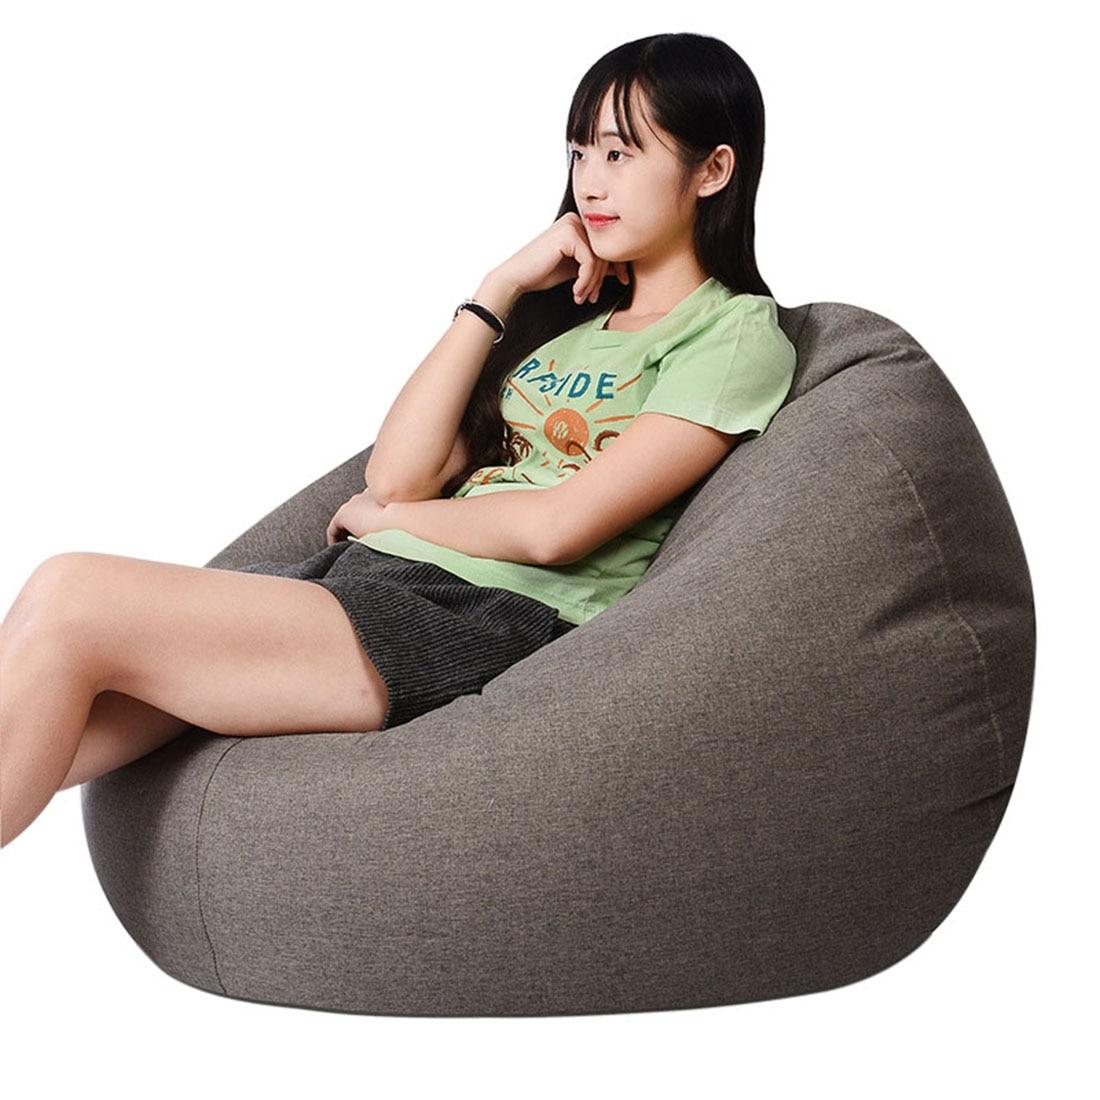 Admirable Volwassenen Kinderen Bean Bag Stoel Sofa Woonkamer Lounger Creativecarmelina Interior Chair Design Creativecarmelinacom